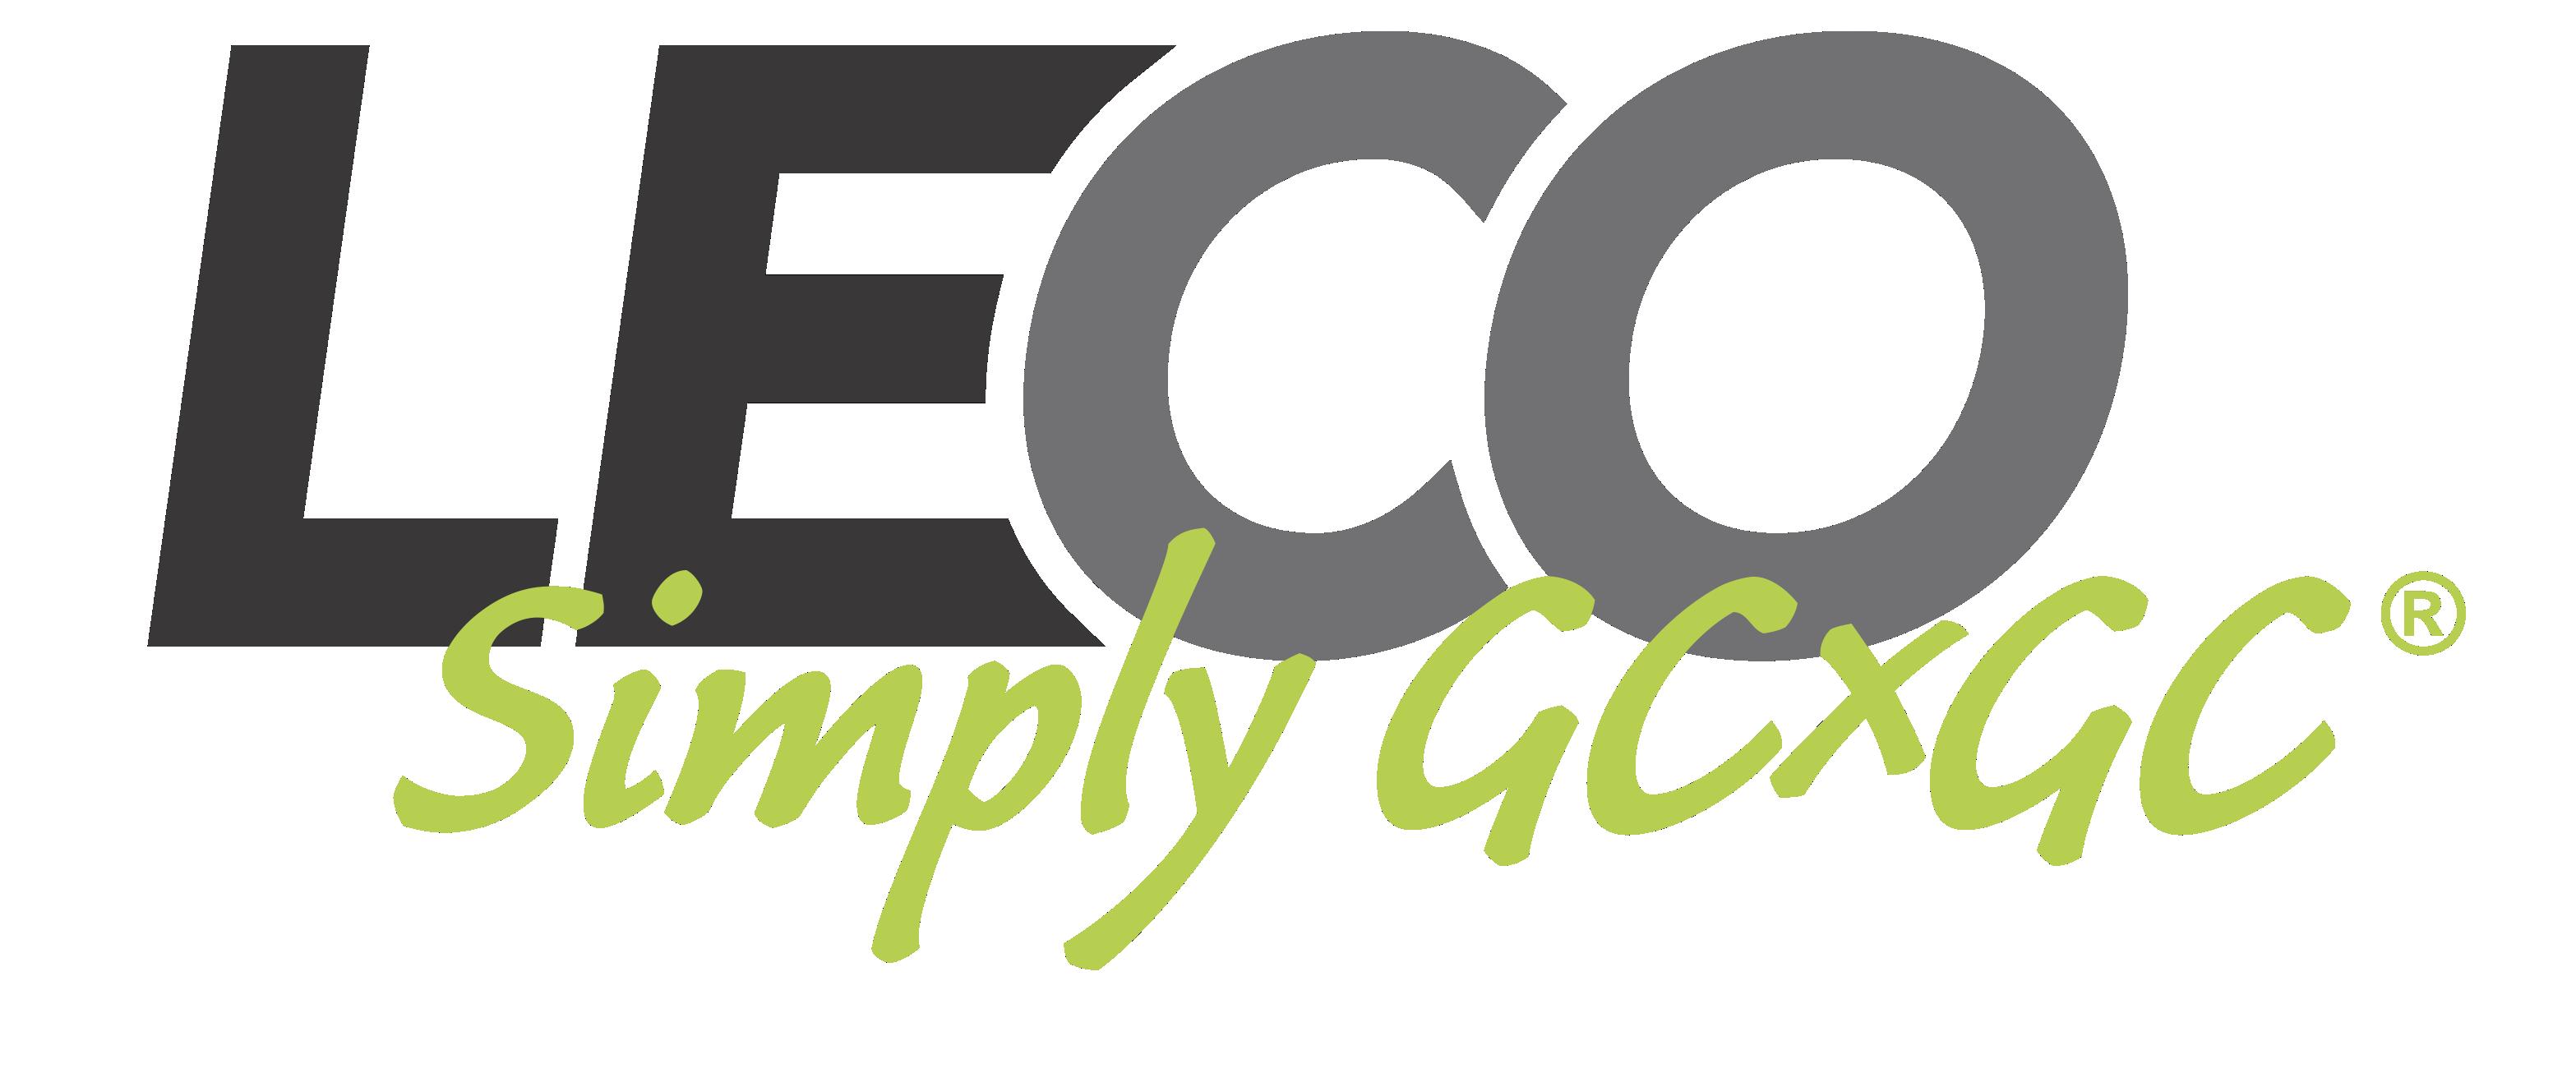 Simply GCxGC Logo 2019